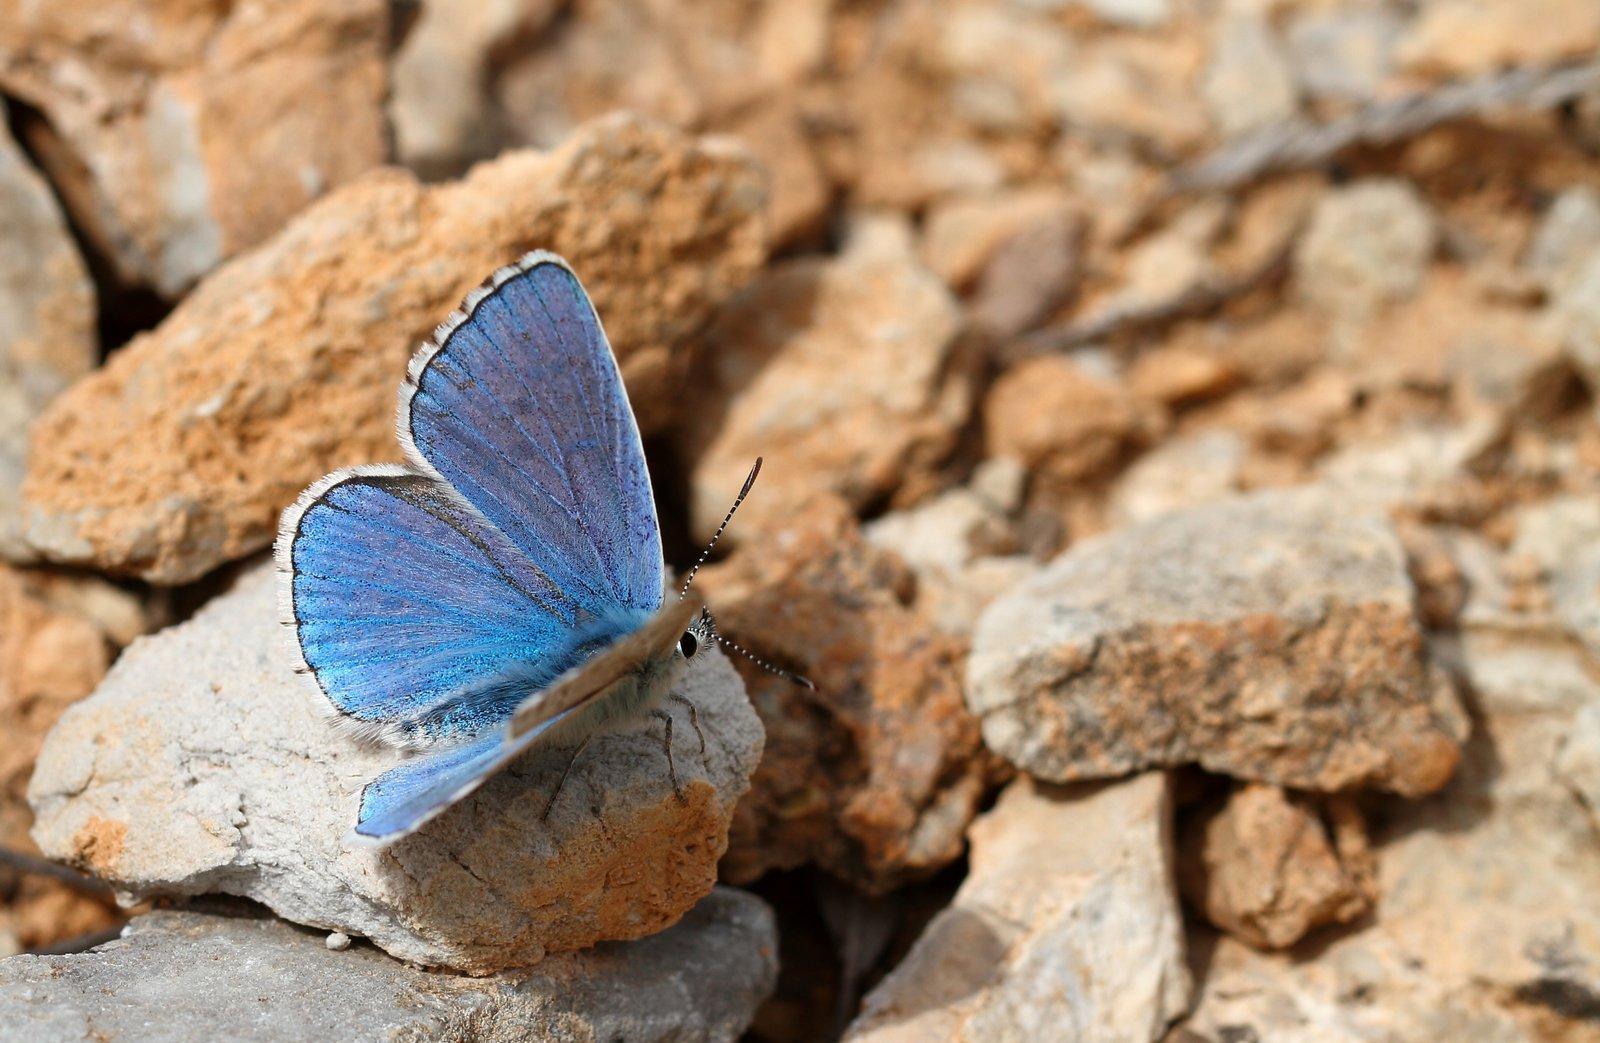 Adonisblåfugl, Lysandra bellargus